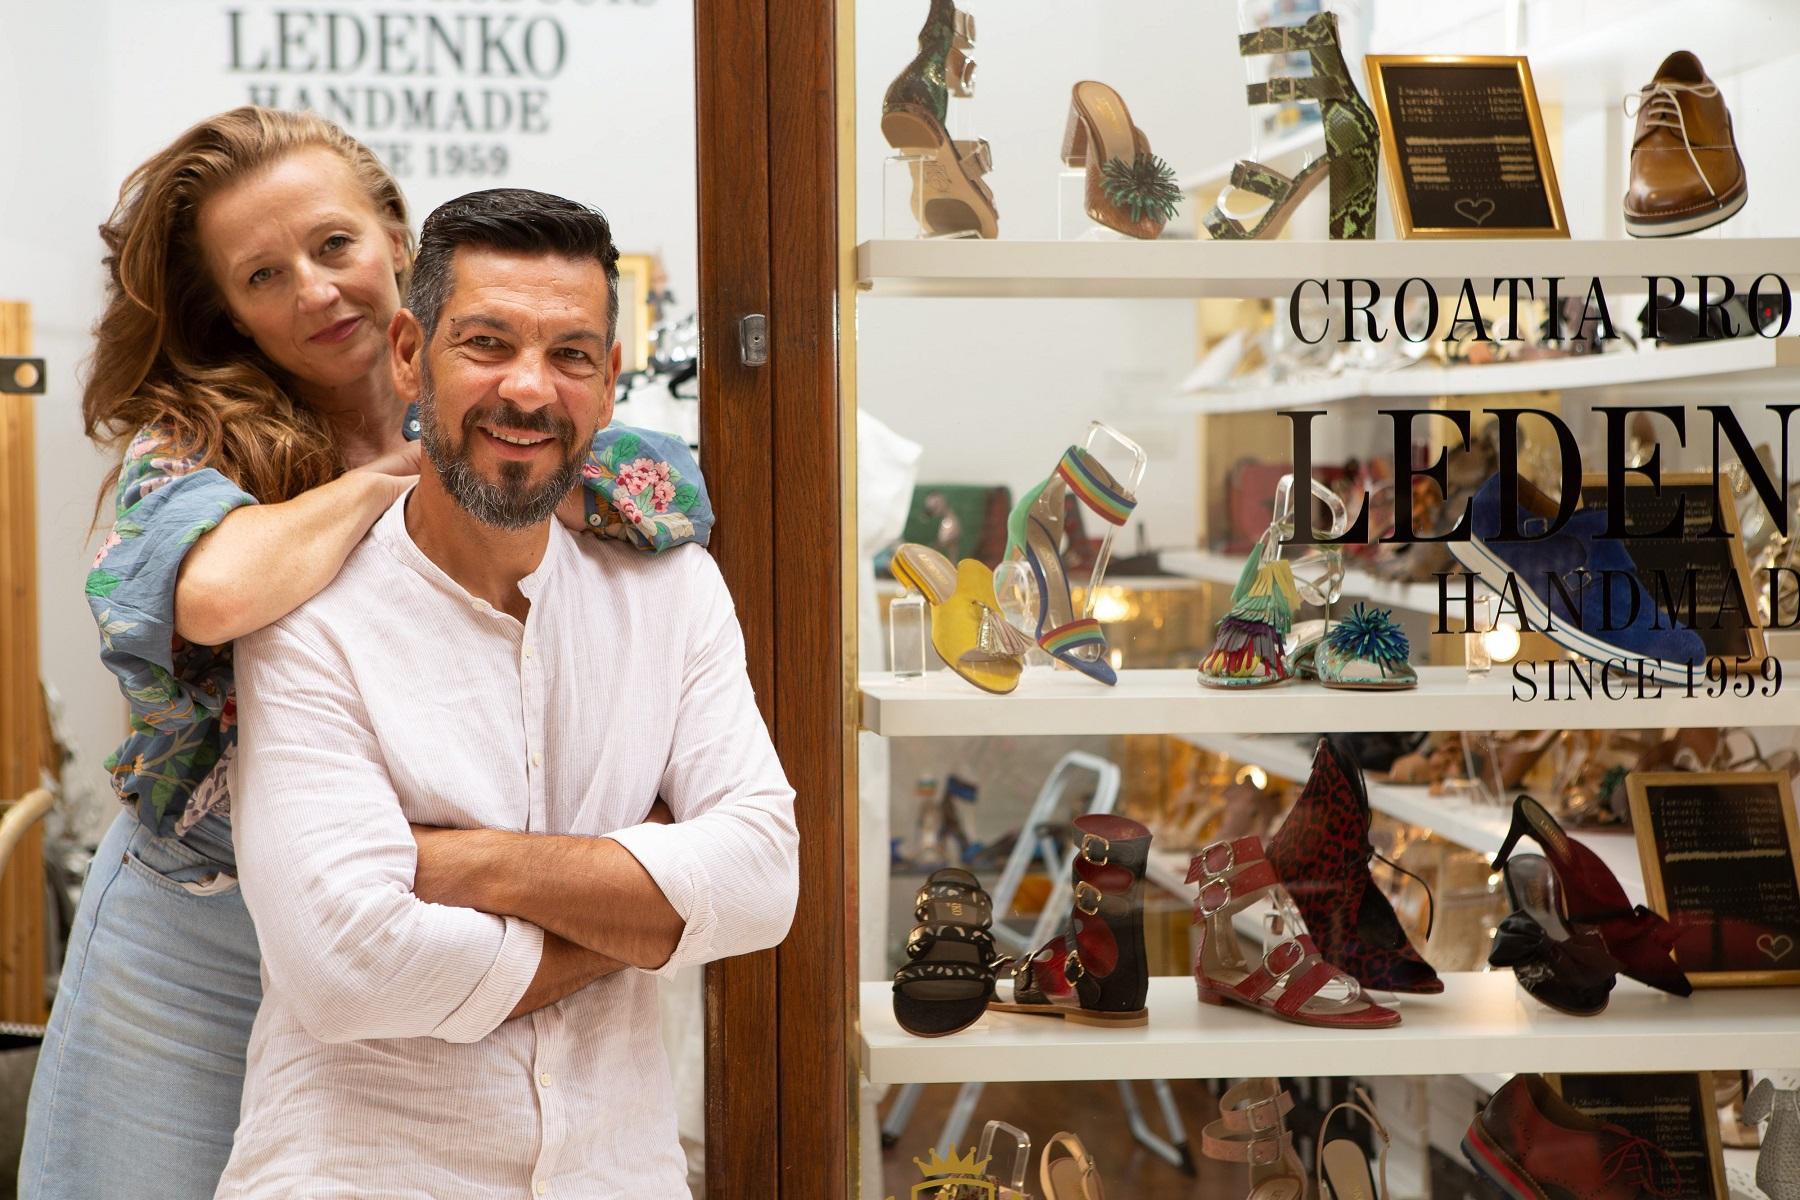 Split,100719. Ivan Ledenko i supruga Sandra, splitski dizajneri i proizvodjaci sipela sa kastelanskom adresom i trgovinom u splitskoj gradskoj jezgri. Foto: Sasa Buric / CROPIX